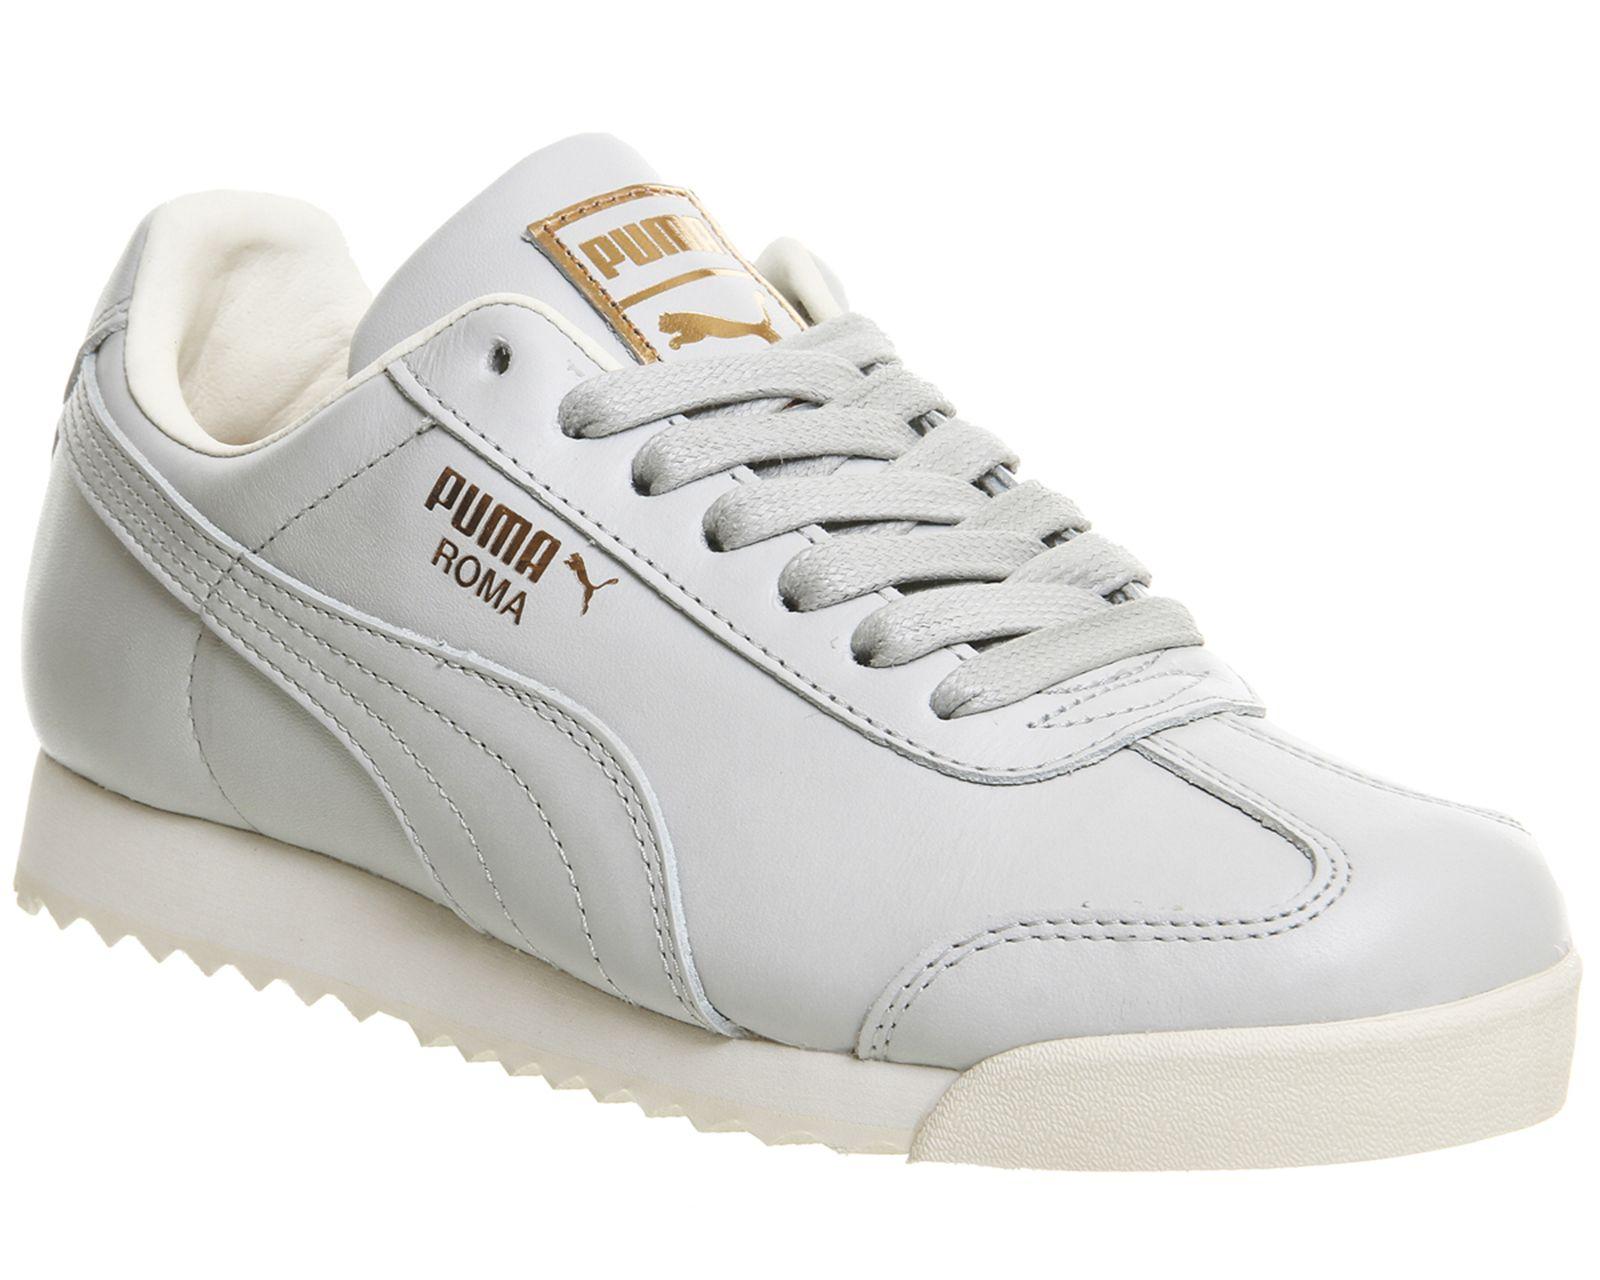 24d82b19 Puma Roma Glacier Grey Lthr Exc | Pumas | Shoes, White leather, Sneakers